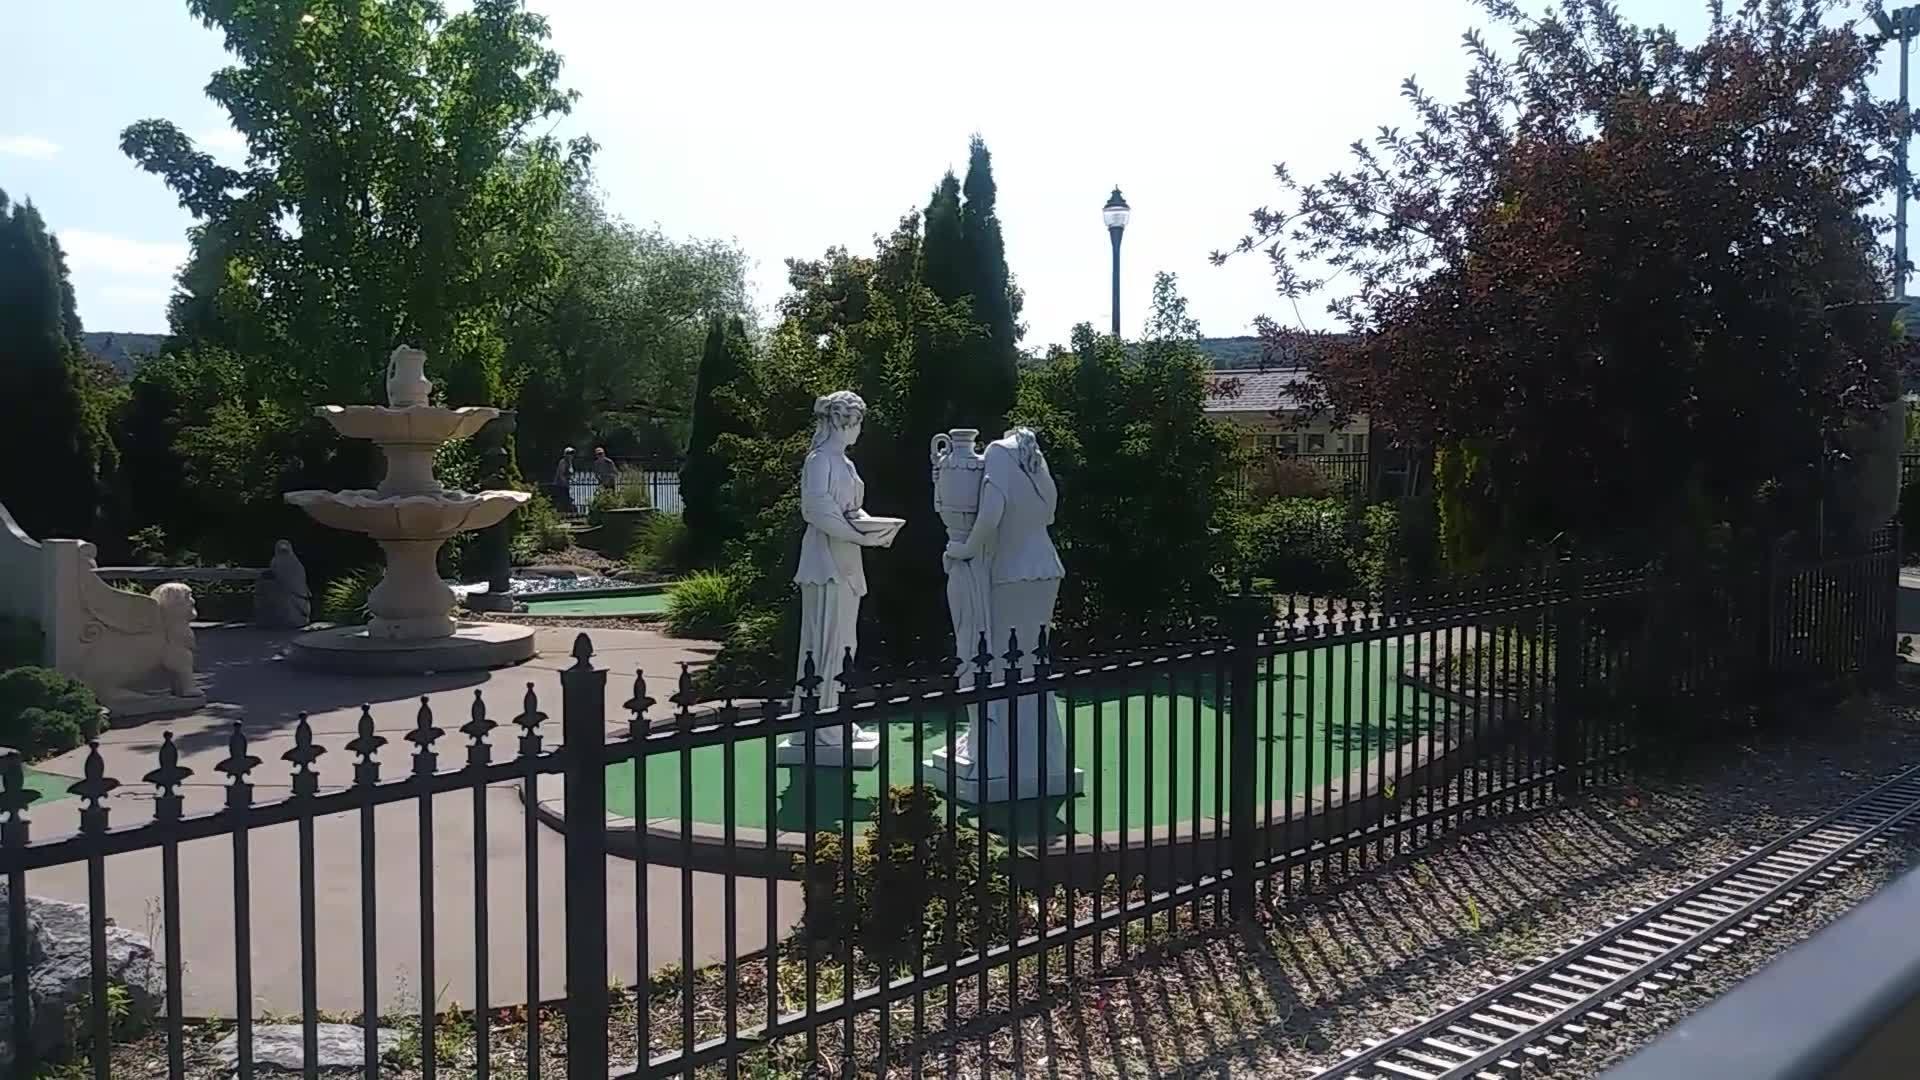 Decapitated Statue 2